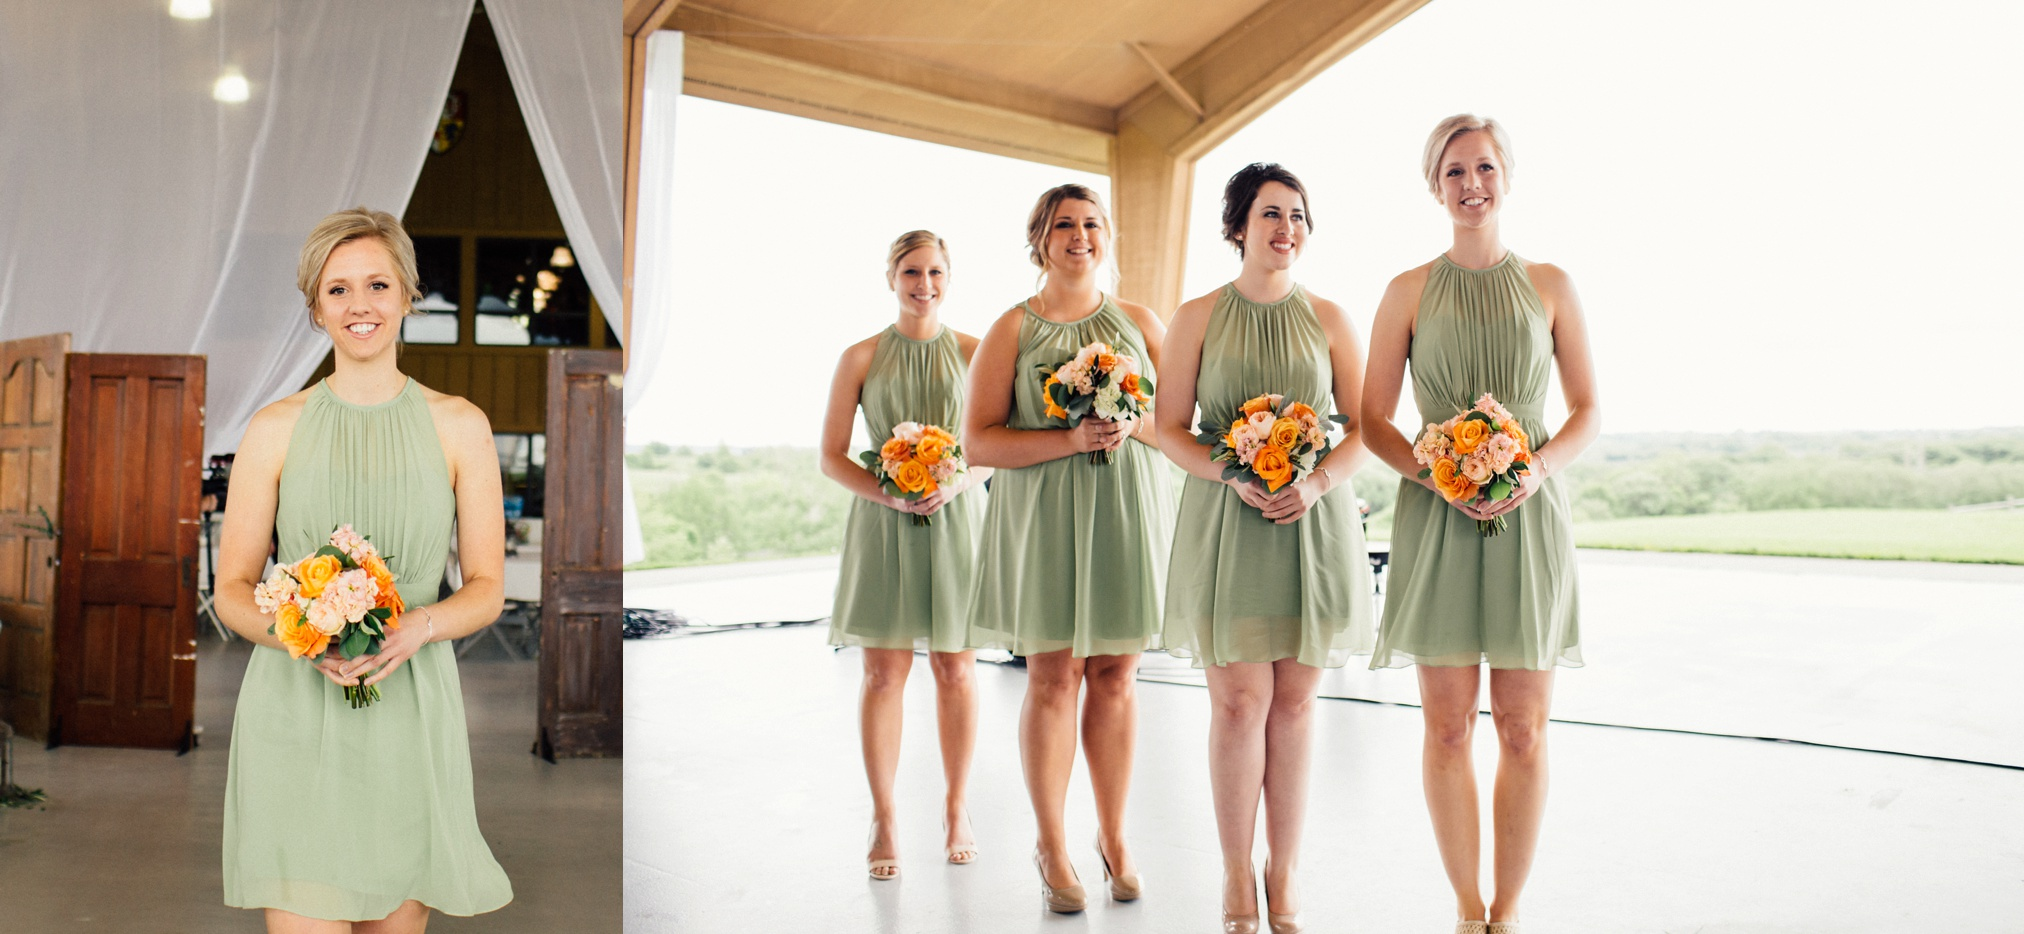 schmid_wedding-343.jpg